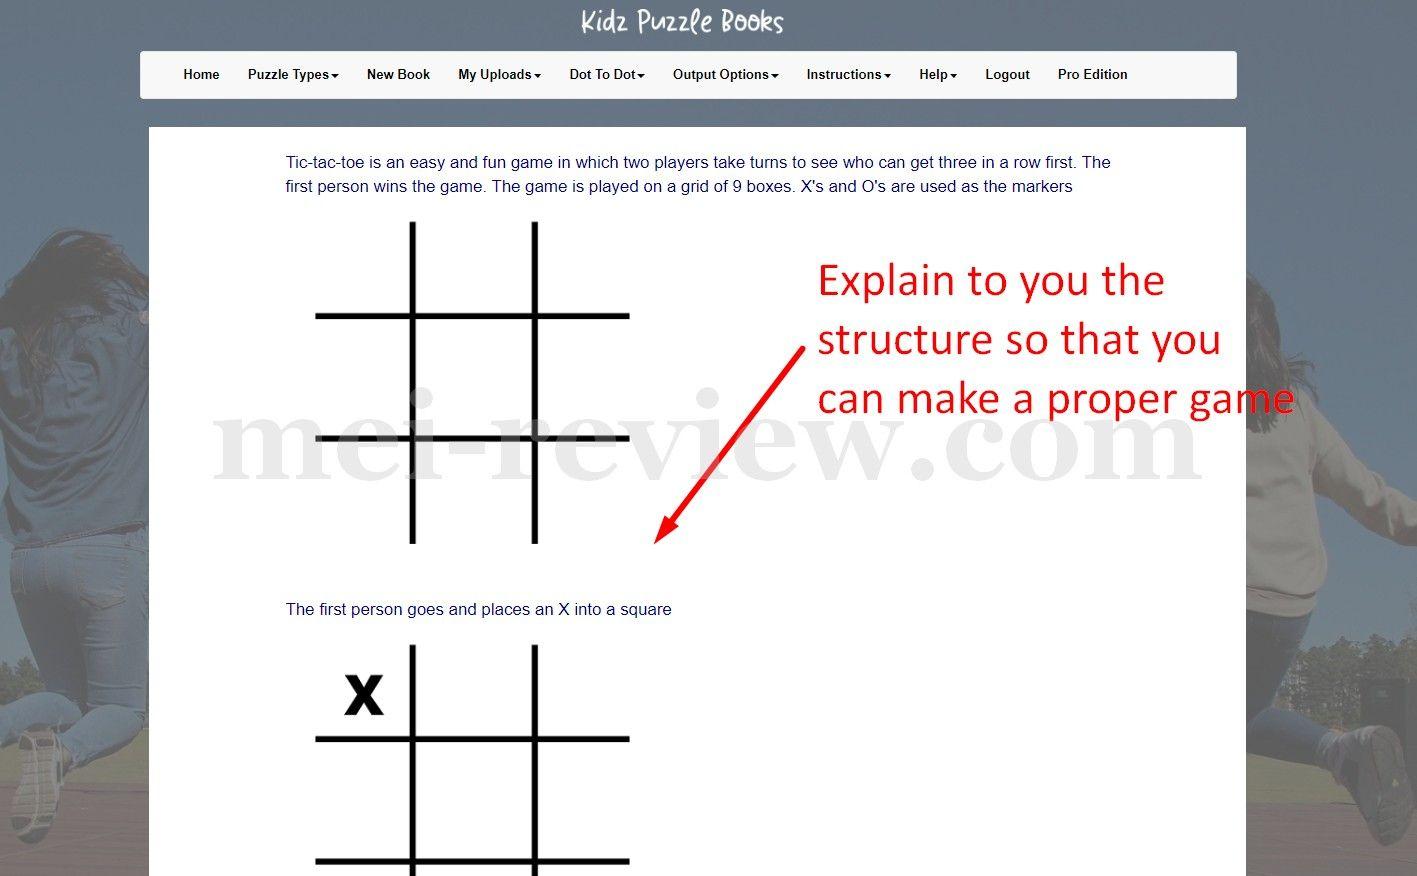 Kidz-Puzzle-Books-4-type